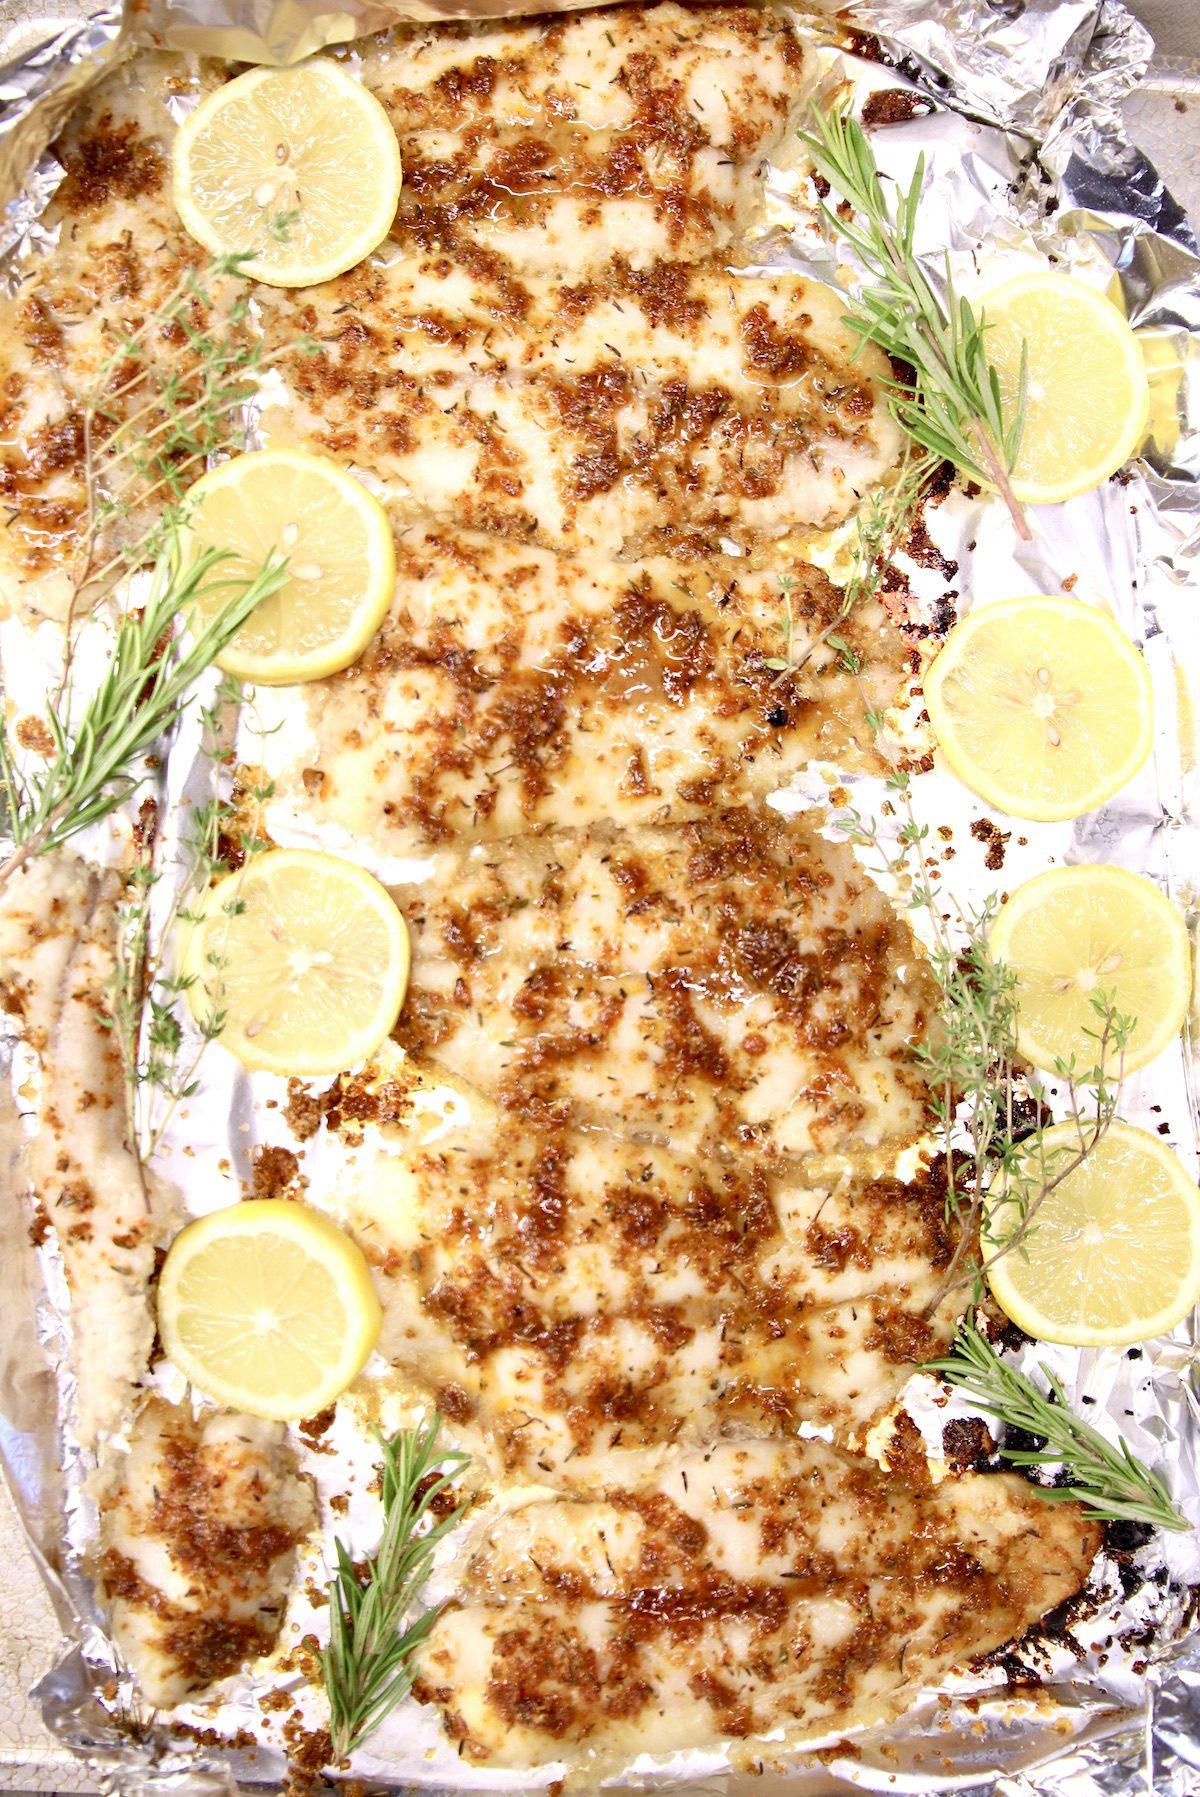 fish filets with lemon rub, lemon and herb garnish